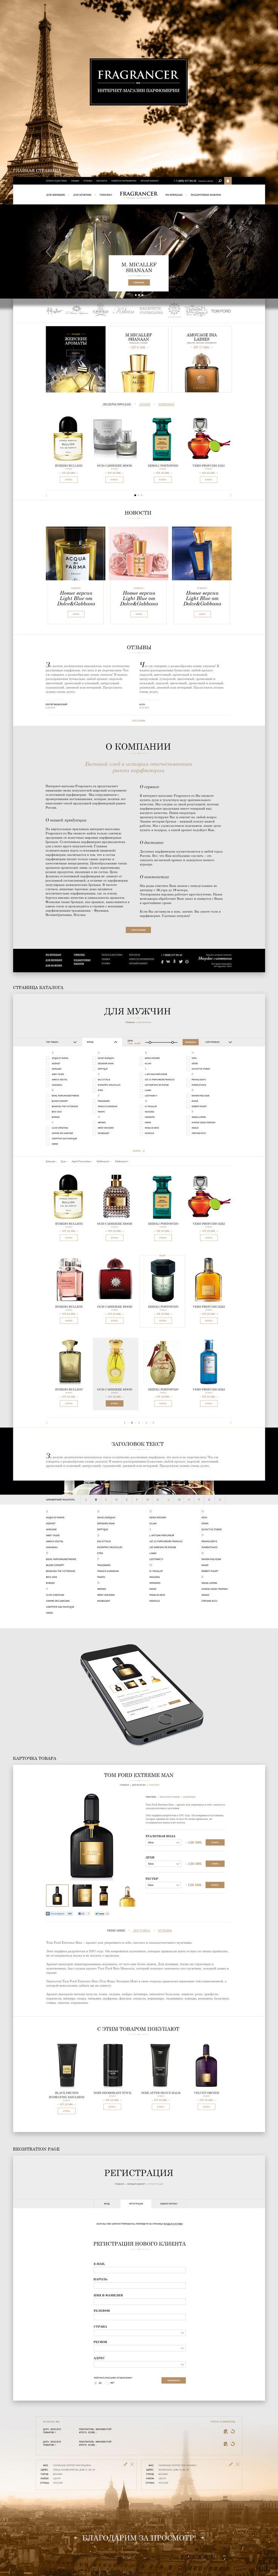 Developed online store luxury perfumes. Unique web design. #shopdev, #opencart…